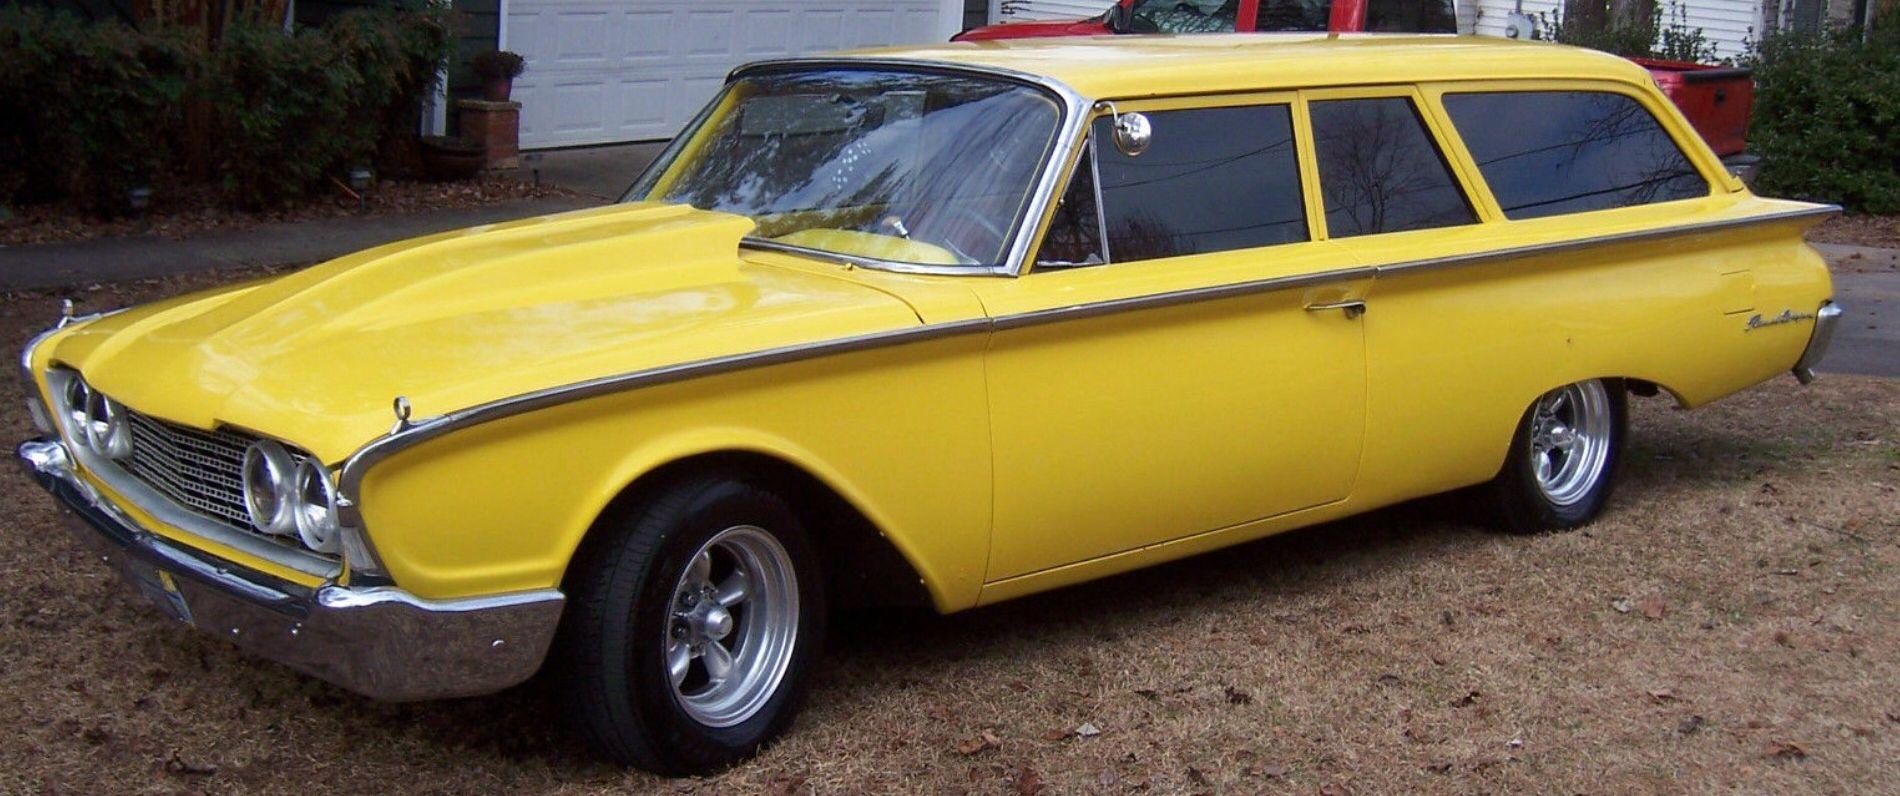 1960 FORD 2 DOOR RANCH WAGON   Ford 2door Wagon   Pinterest   Ford ...